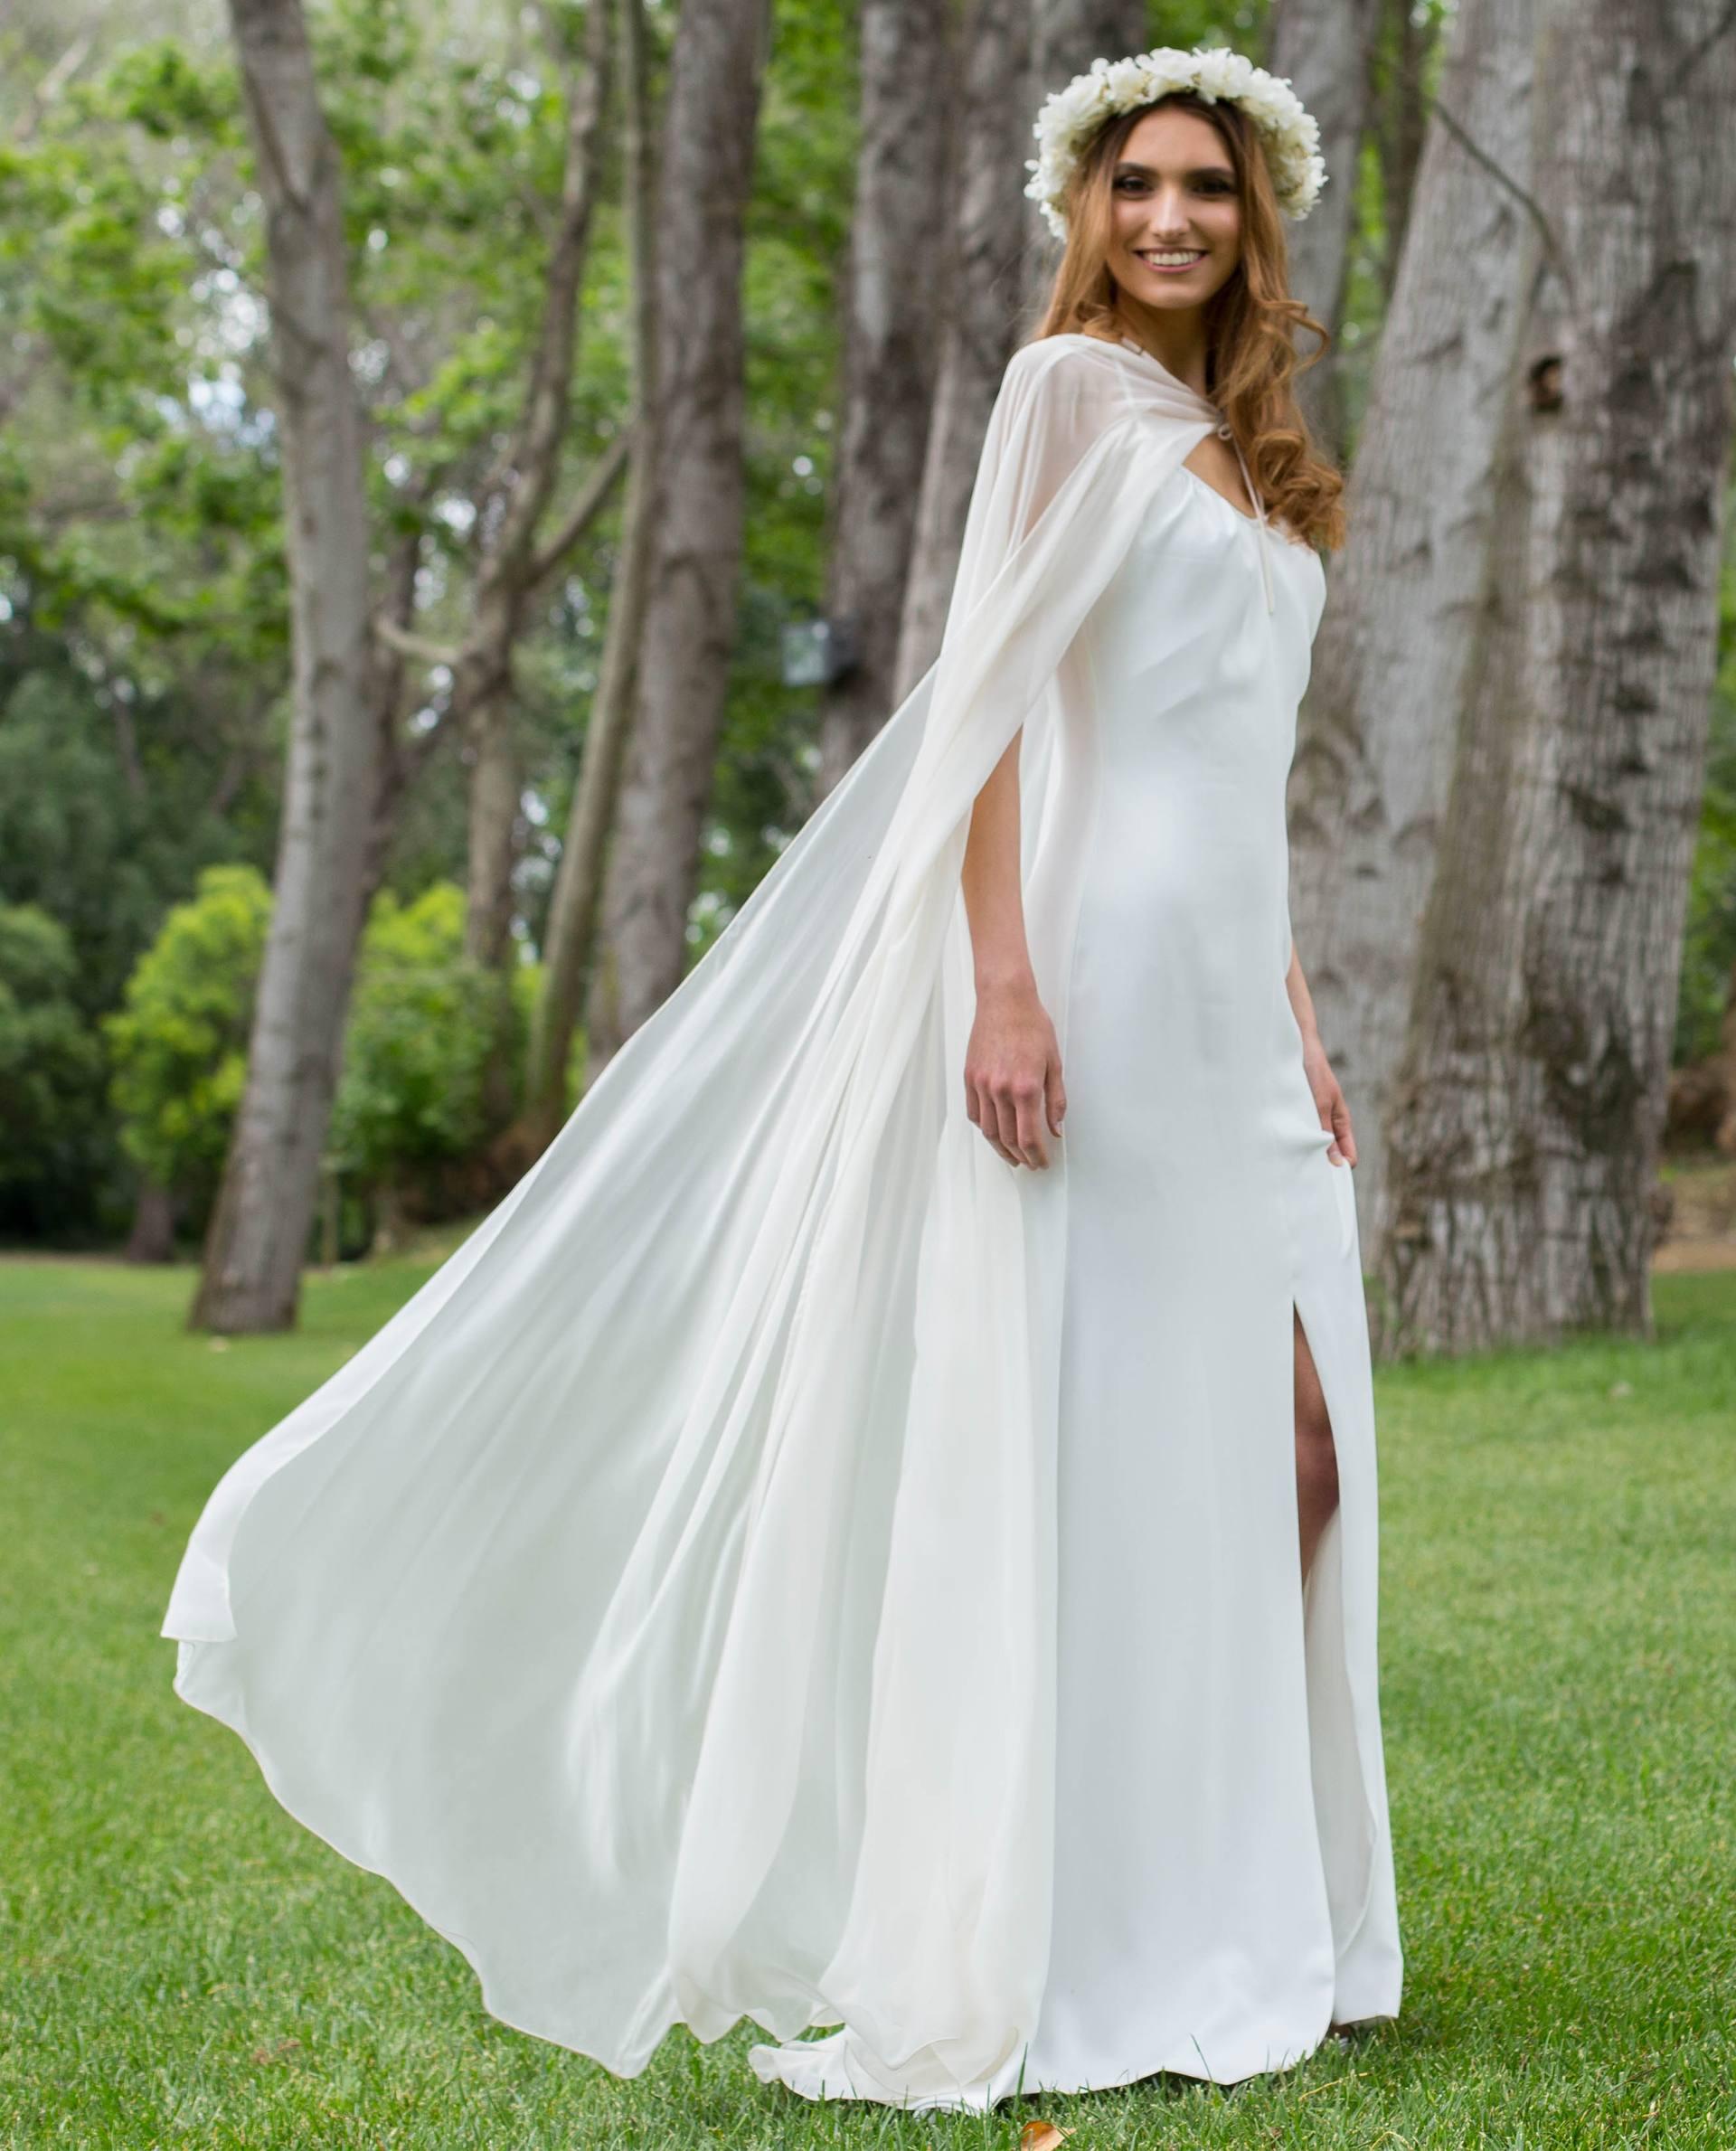 BRIDAL-NATURE 2019 - VESTIDOS - Vestido novia Rebeca con capa Nelda